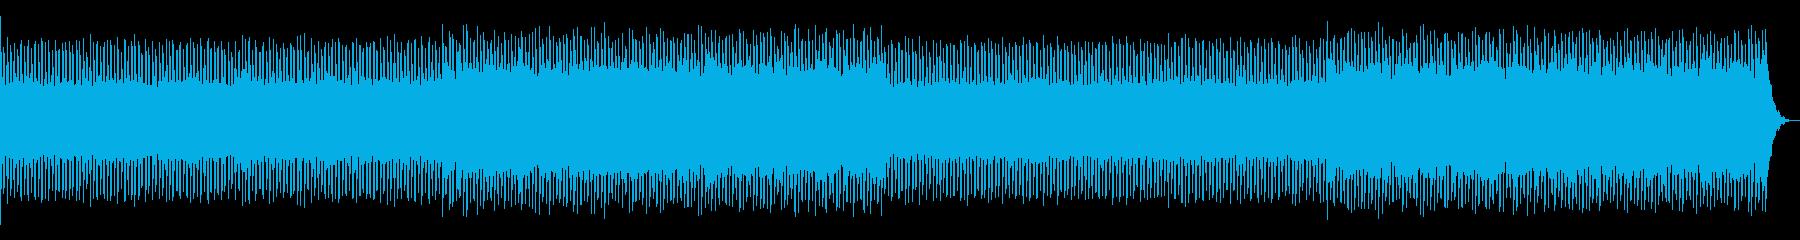 Fantastic, transparent, four-on-the-floor, pop's reproduced waveform